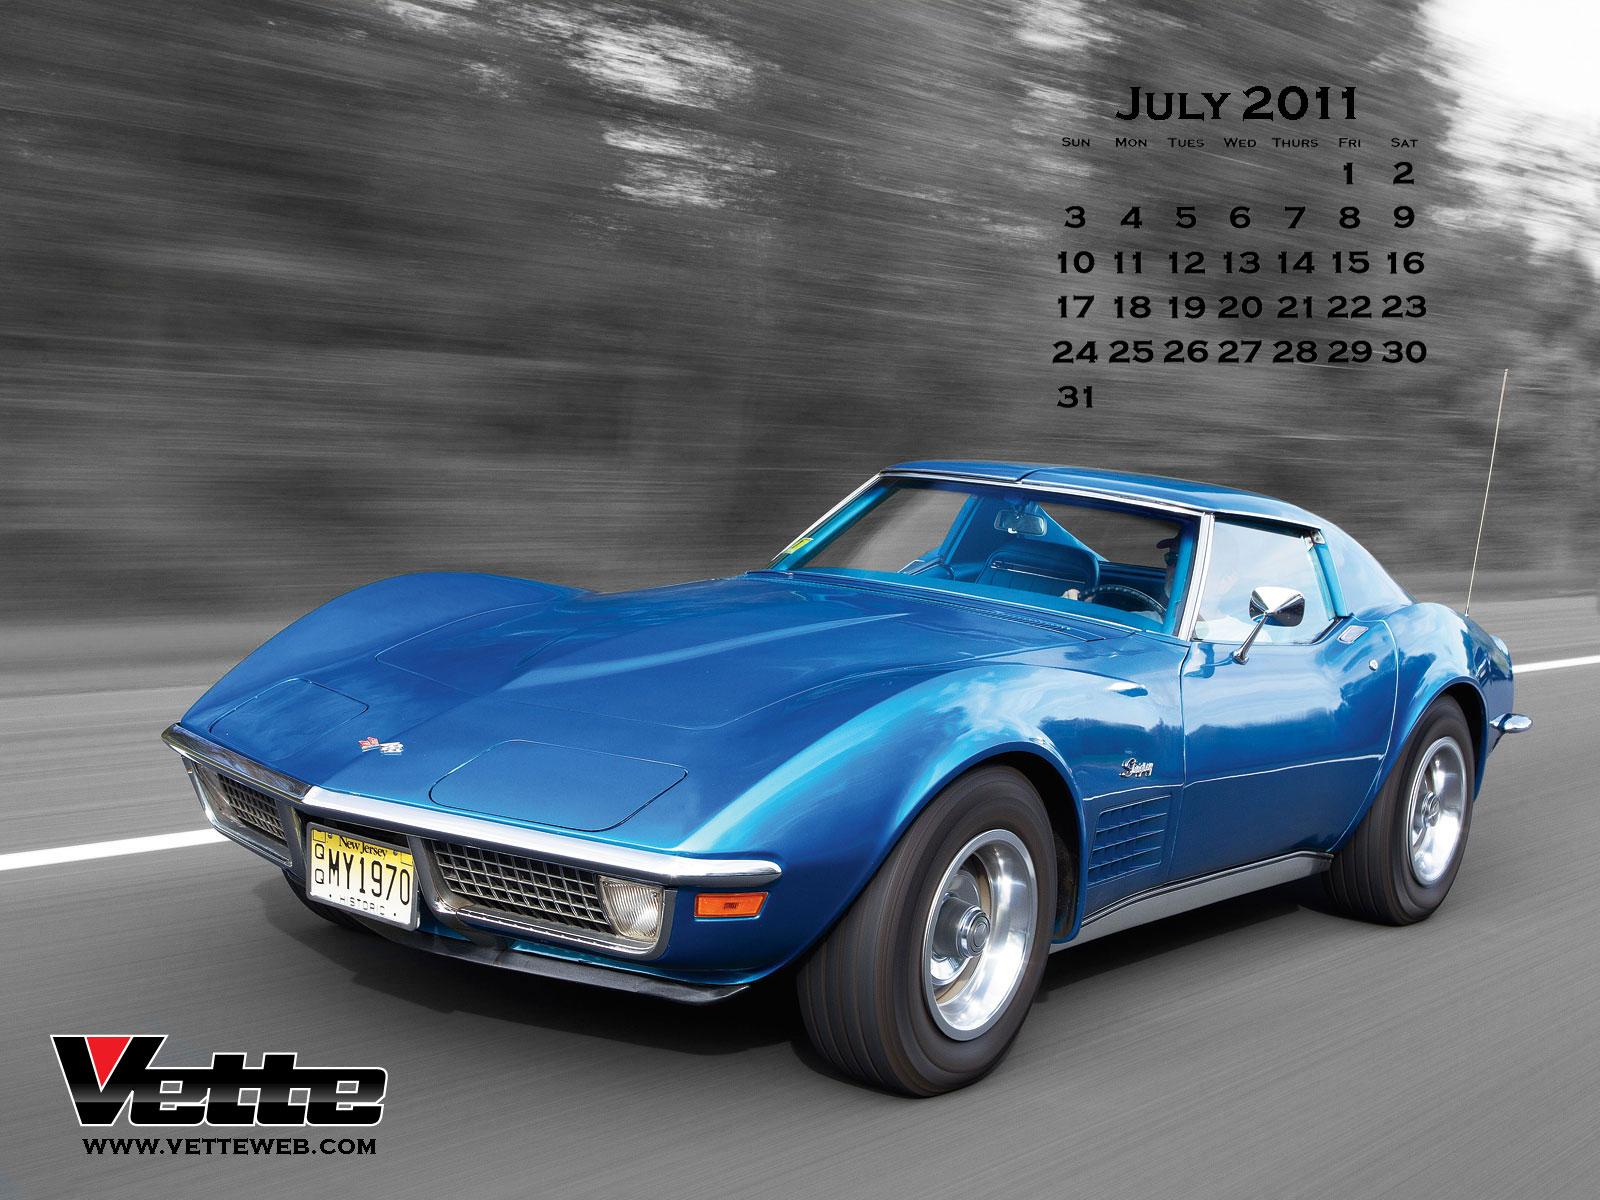 1306 chevy corvette wallpaper photo 1 vemp 1107 chevy corvette c3 1600x1200